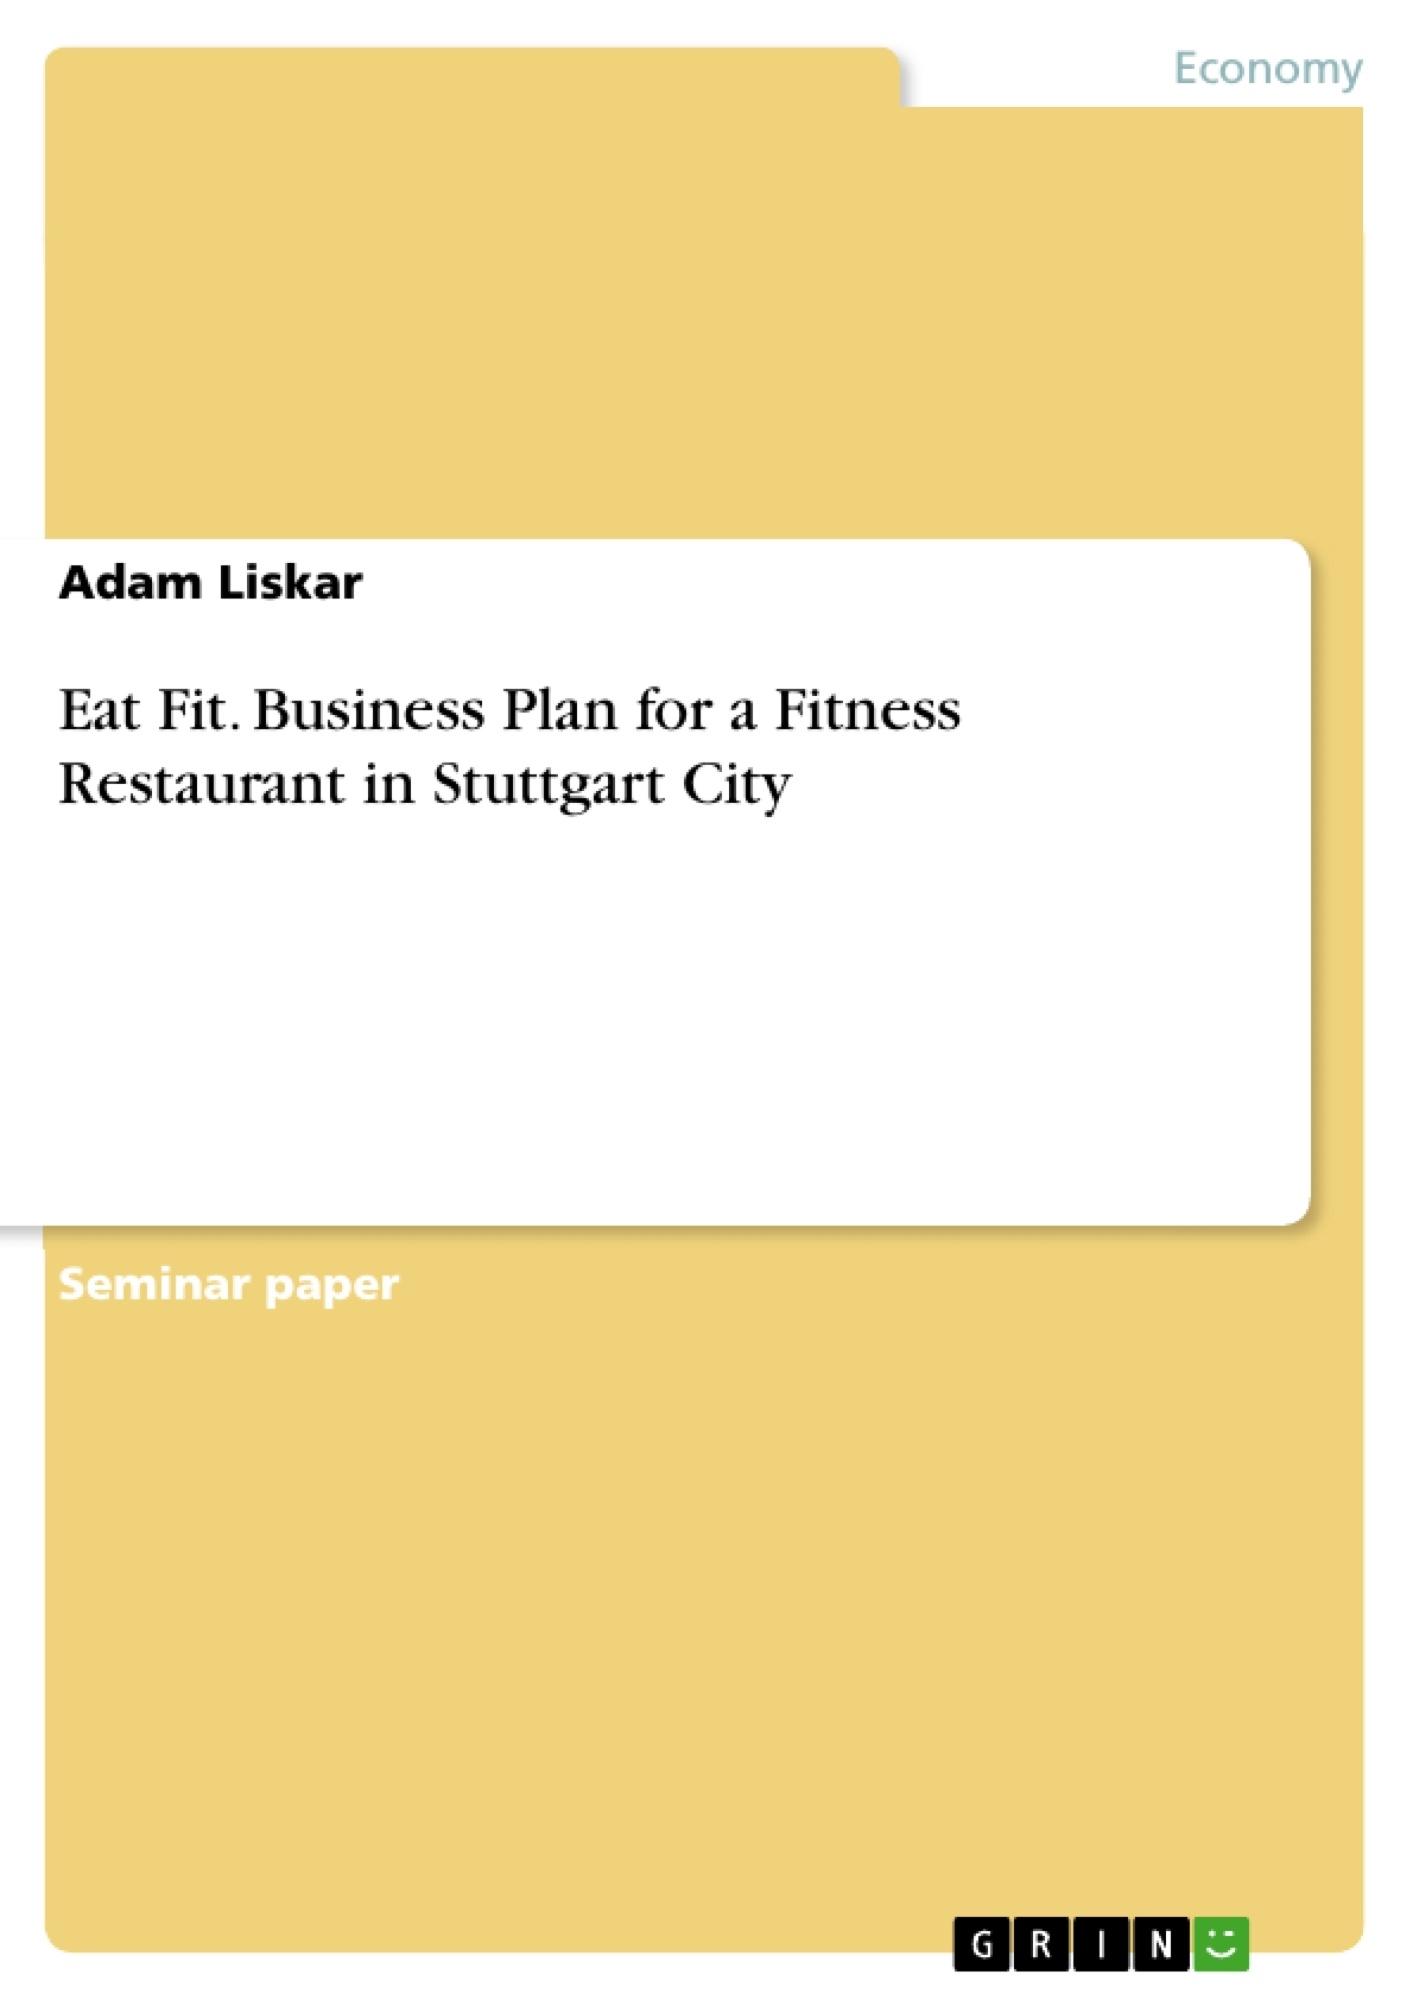 Title: Eat Fit. Business Plan for a Fitness Restaurant in Stuttgart City